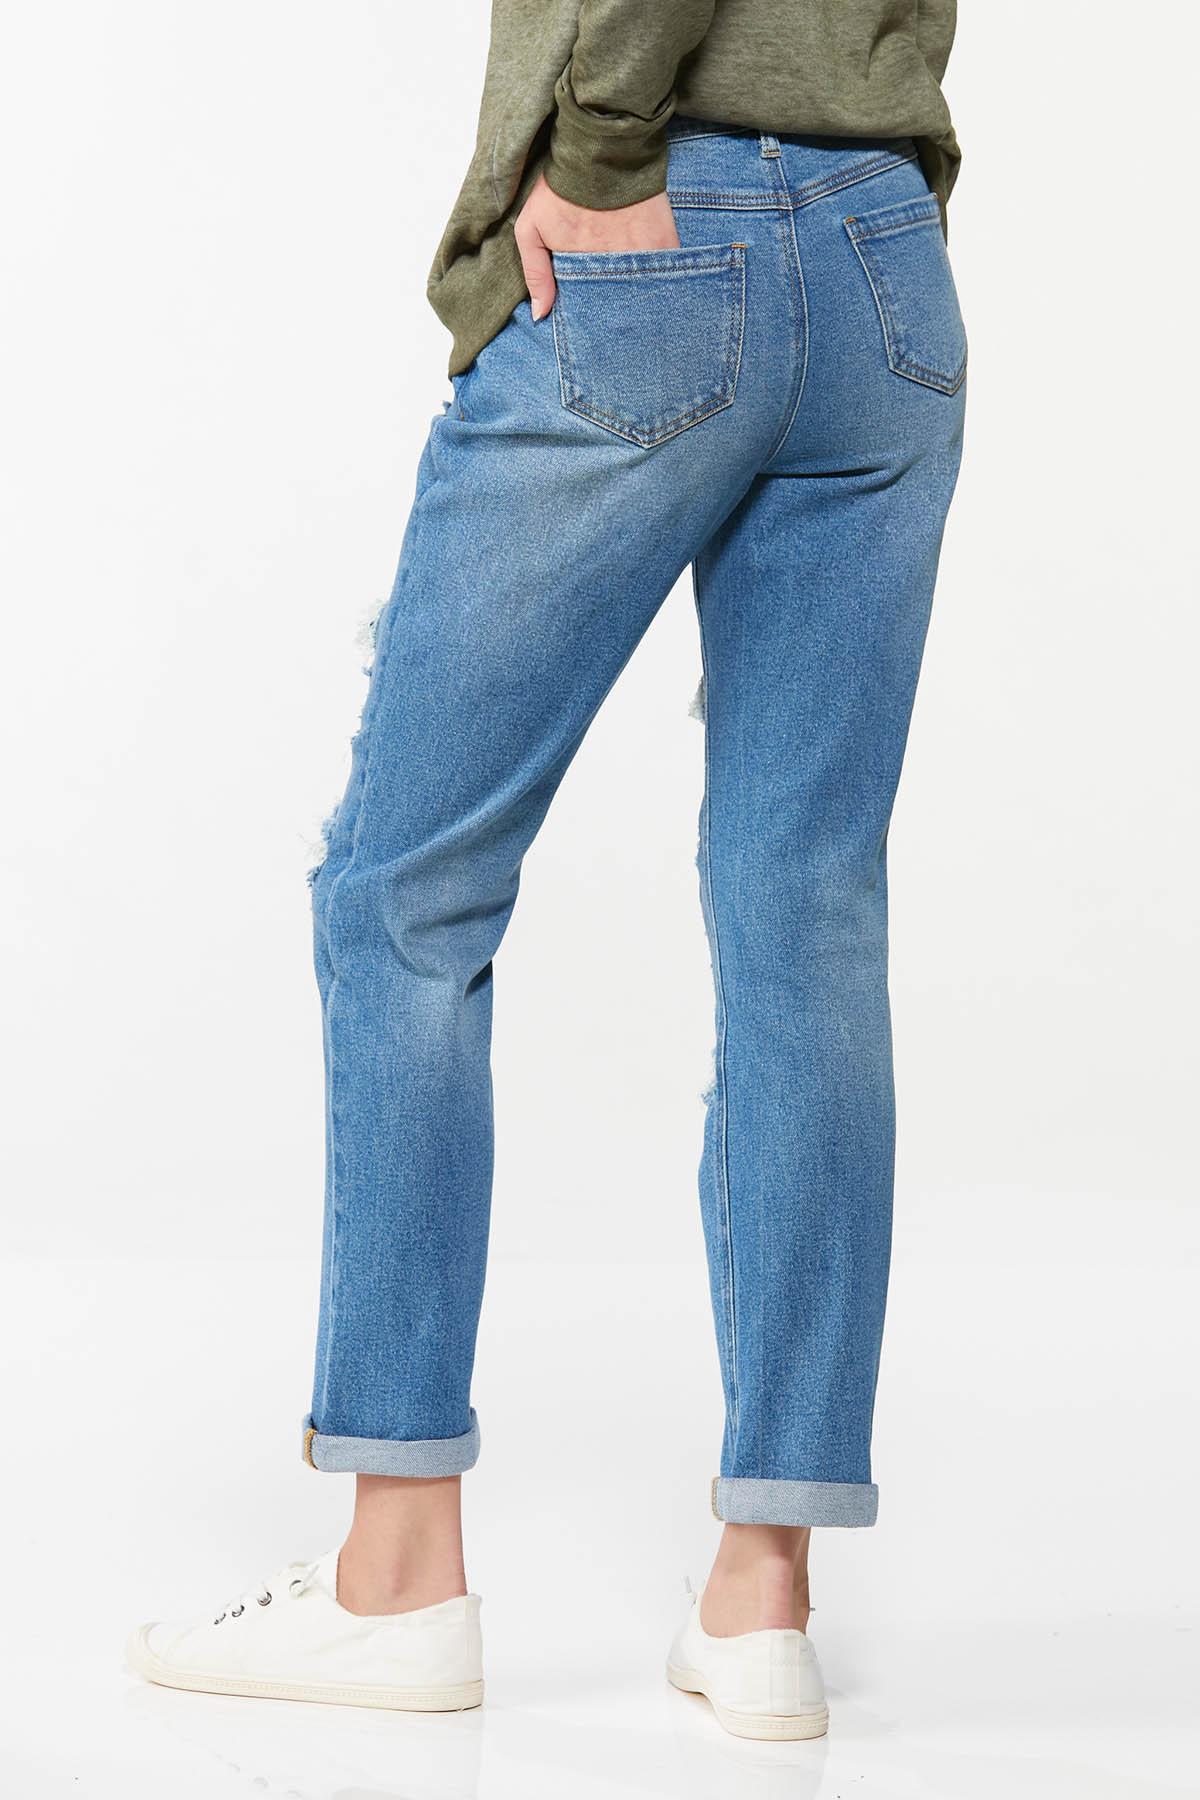 Camo Rip Repair Boyfriend Jeans (Item #44702762)